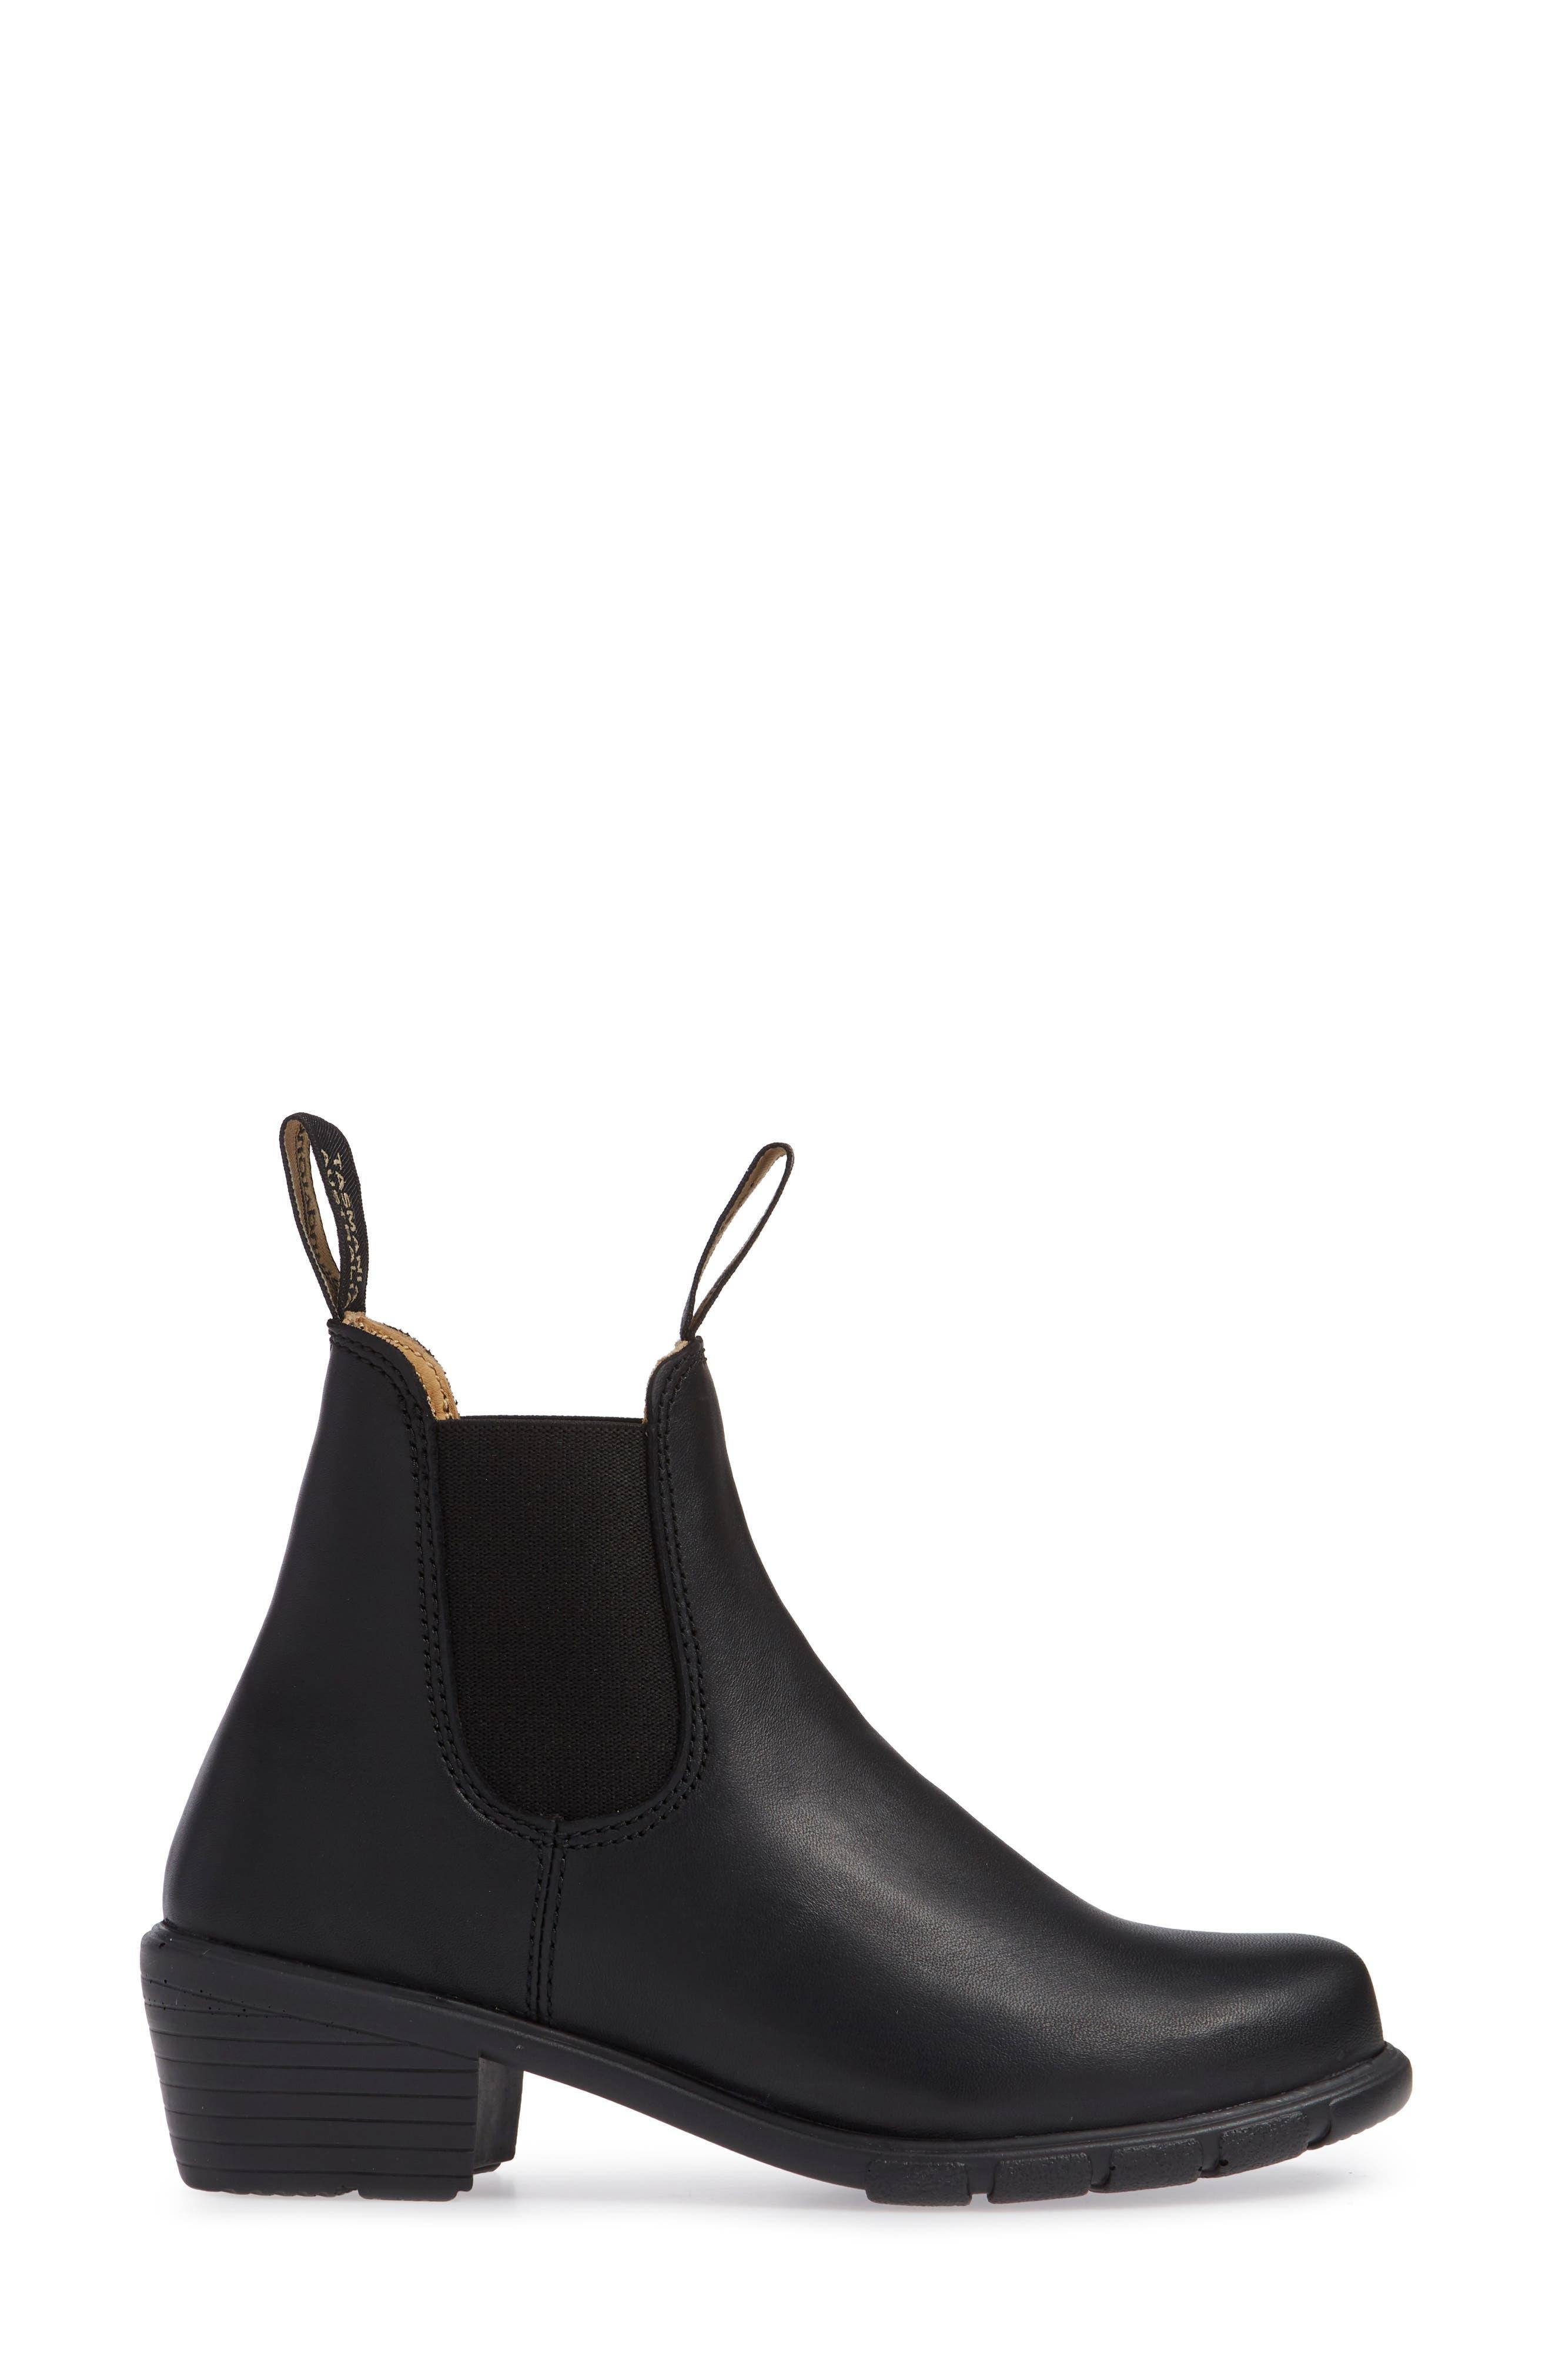 1671 Chelsea Boot,                             Alternate thumbnail 3, color,                             BLACK LEATHER